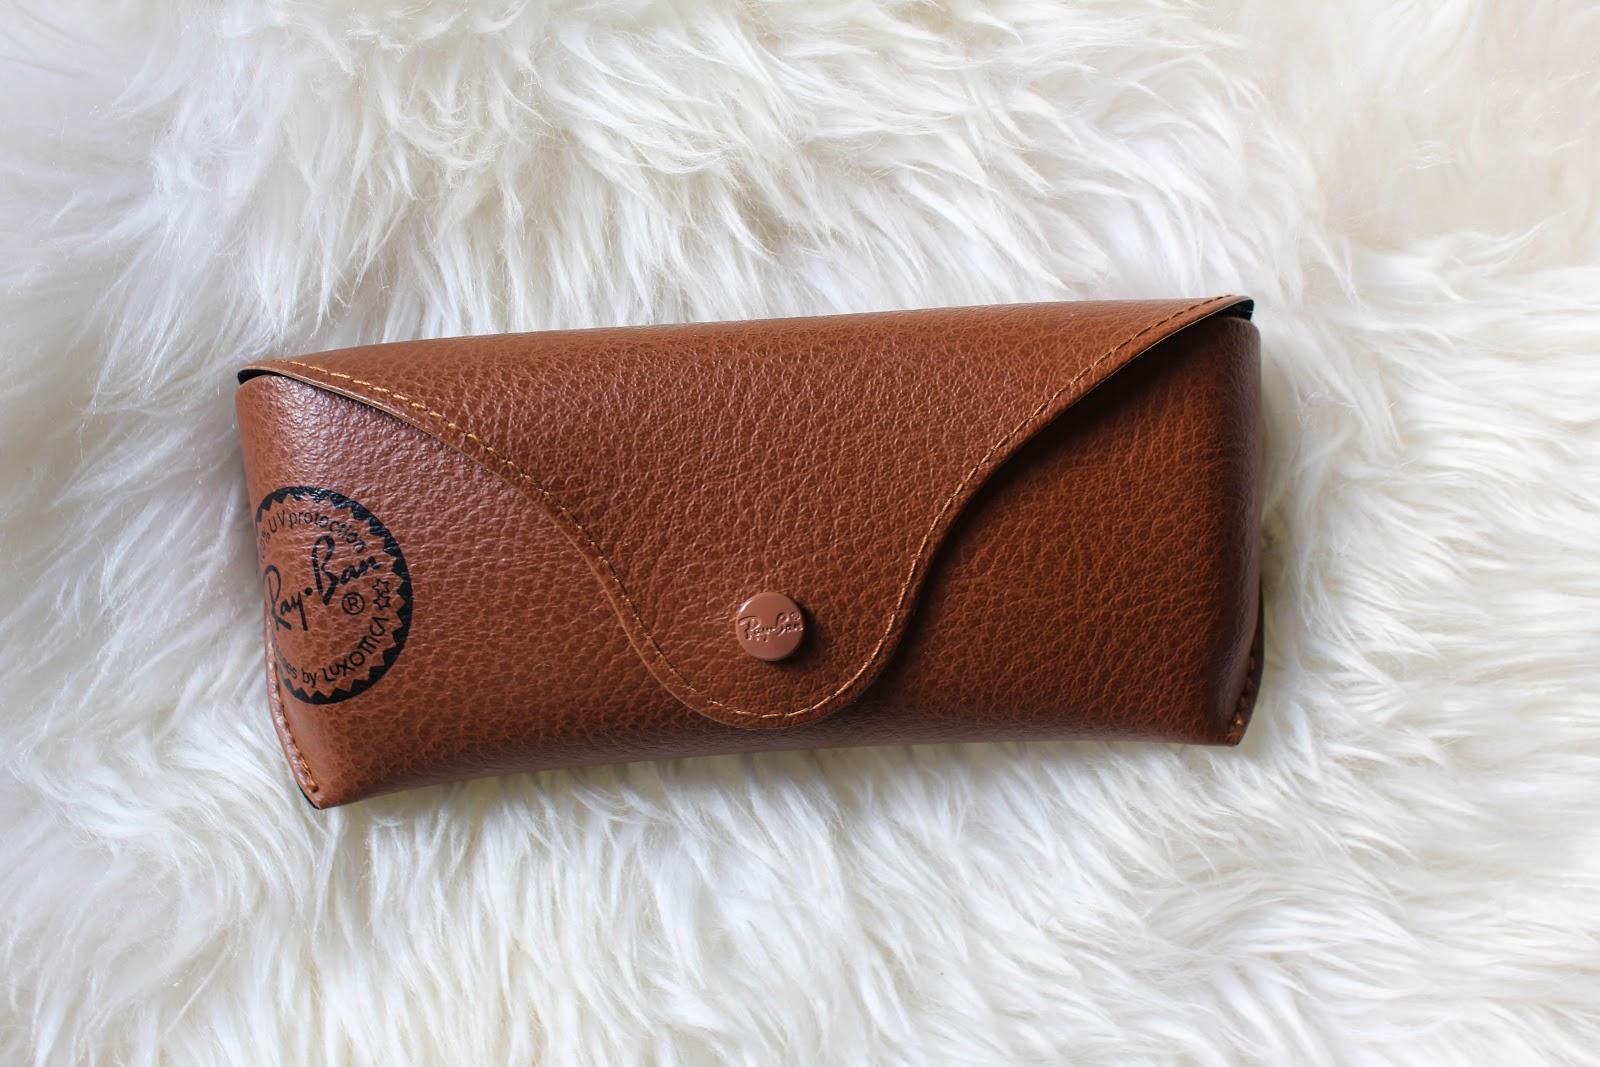 rayban leather case, sunglasses, rayban, style,